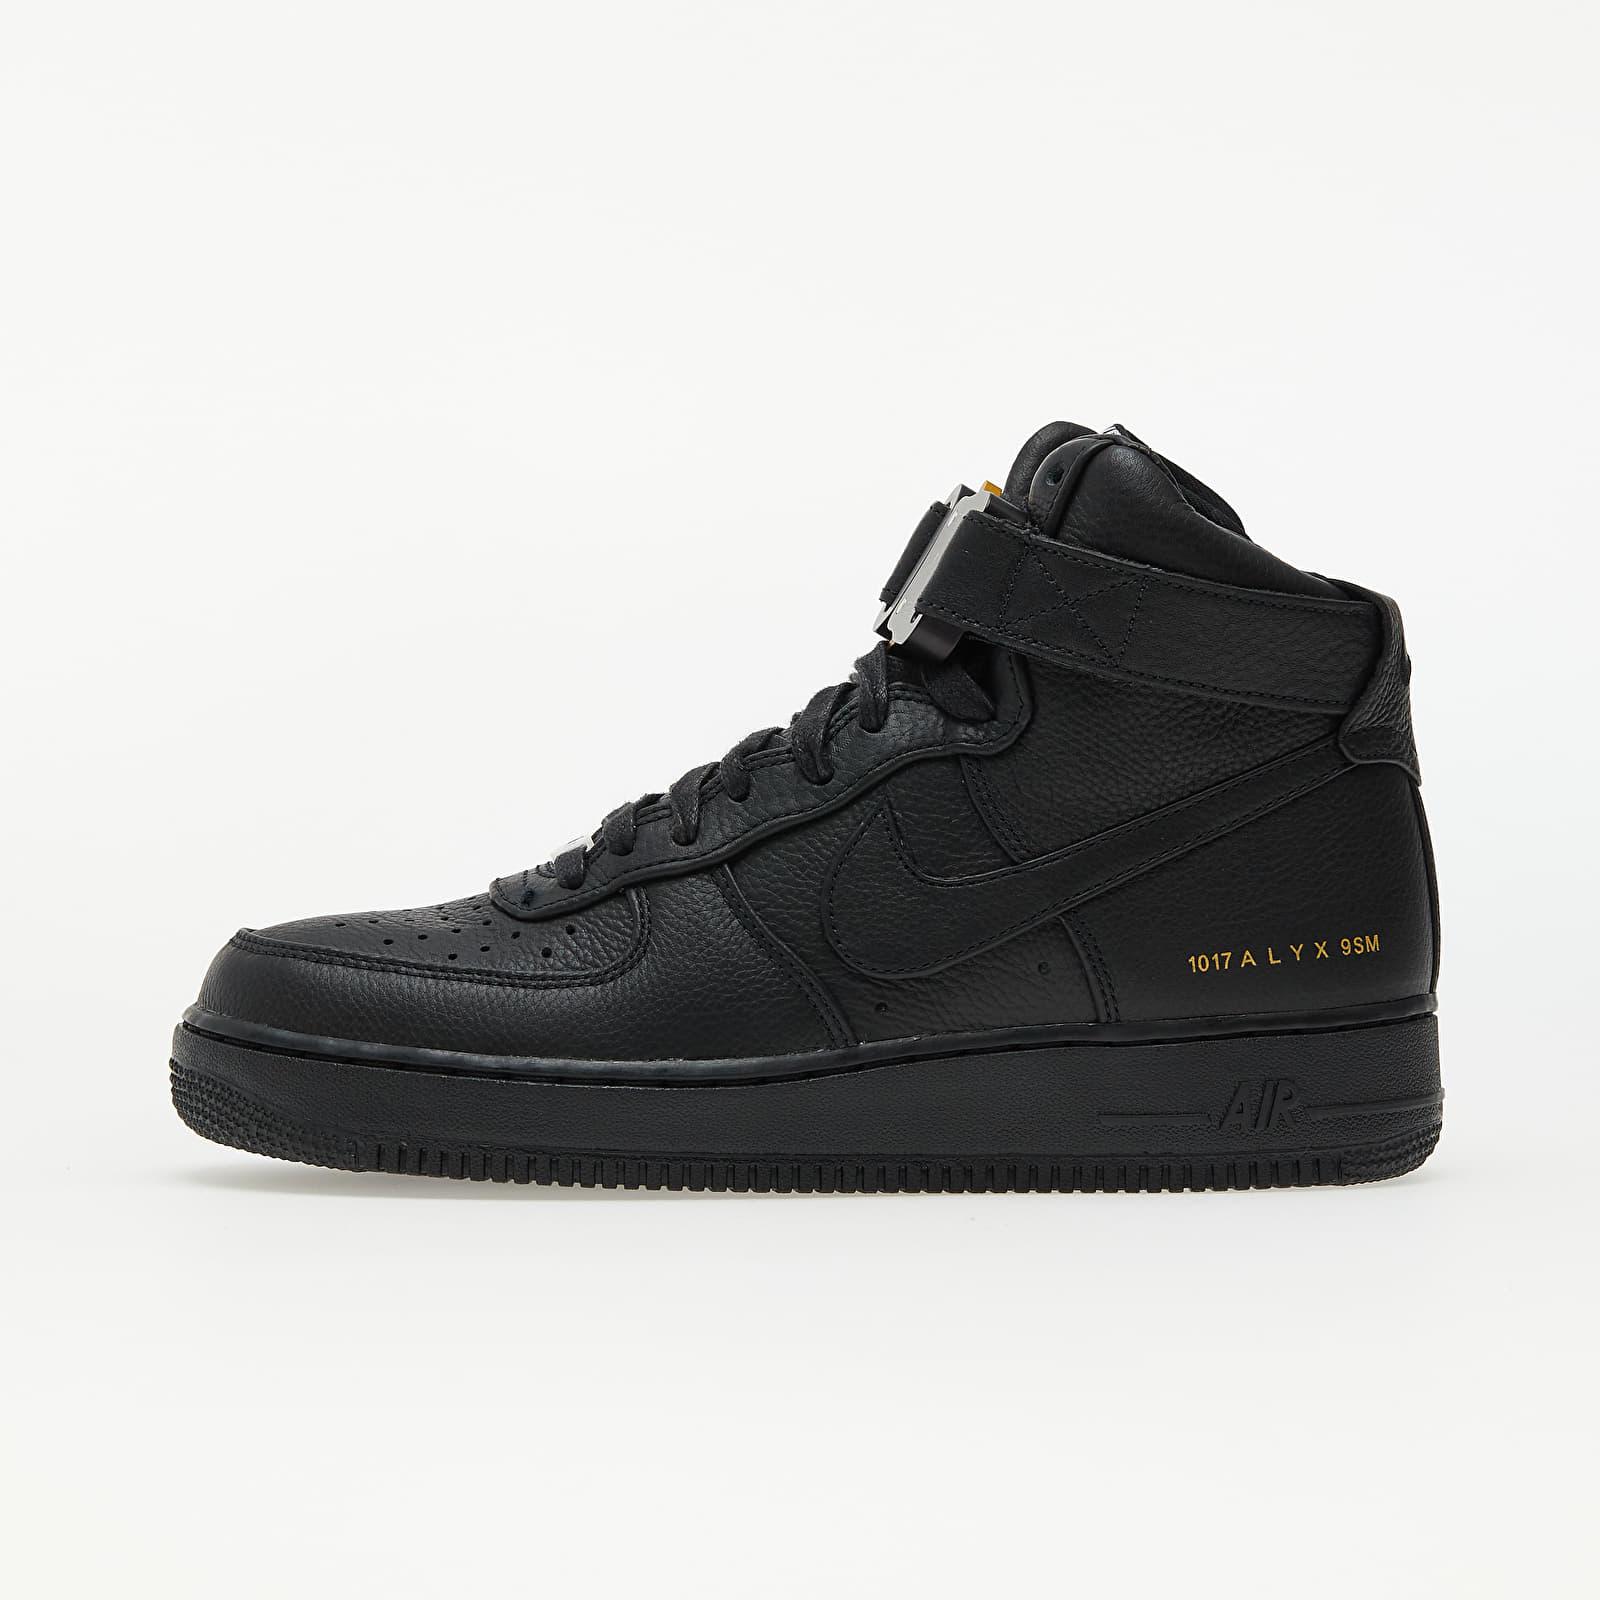 Nike x ALYX Air Force 1 High Black/ Black/ Metallic Gold EUR 38